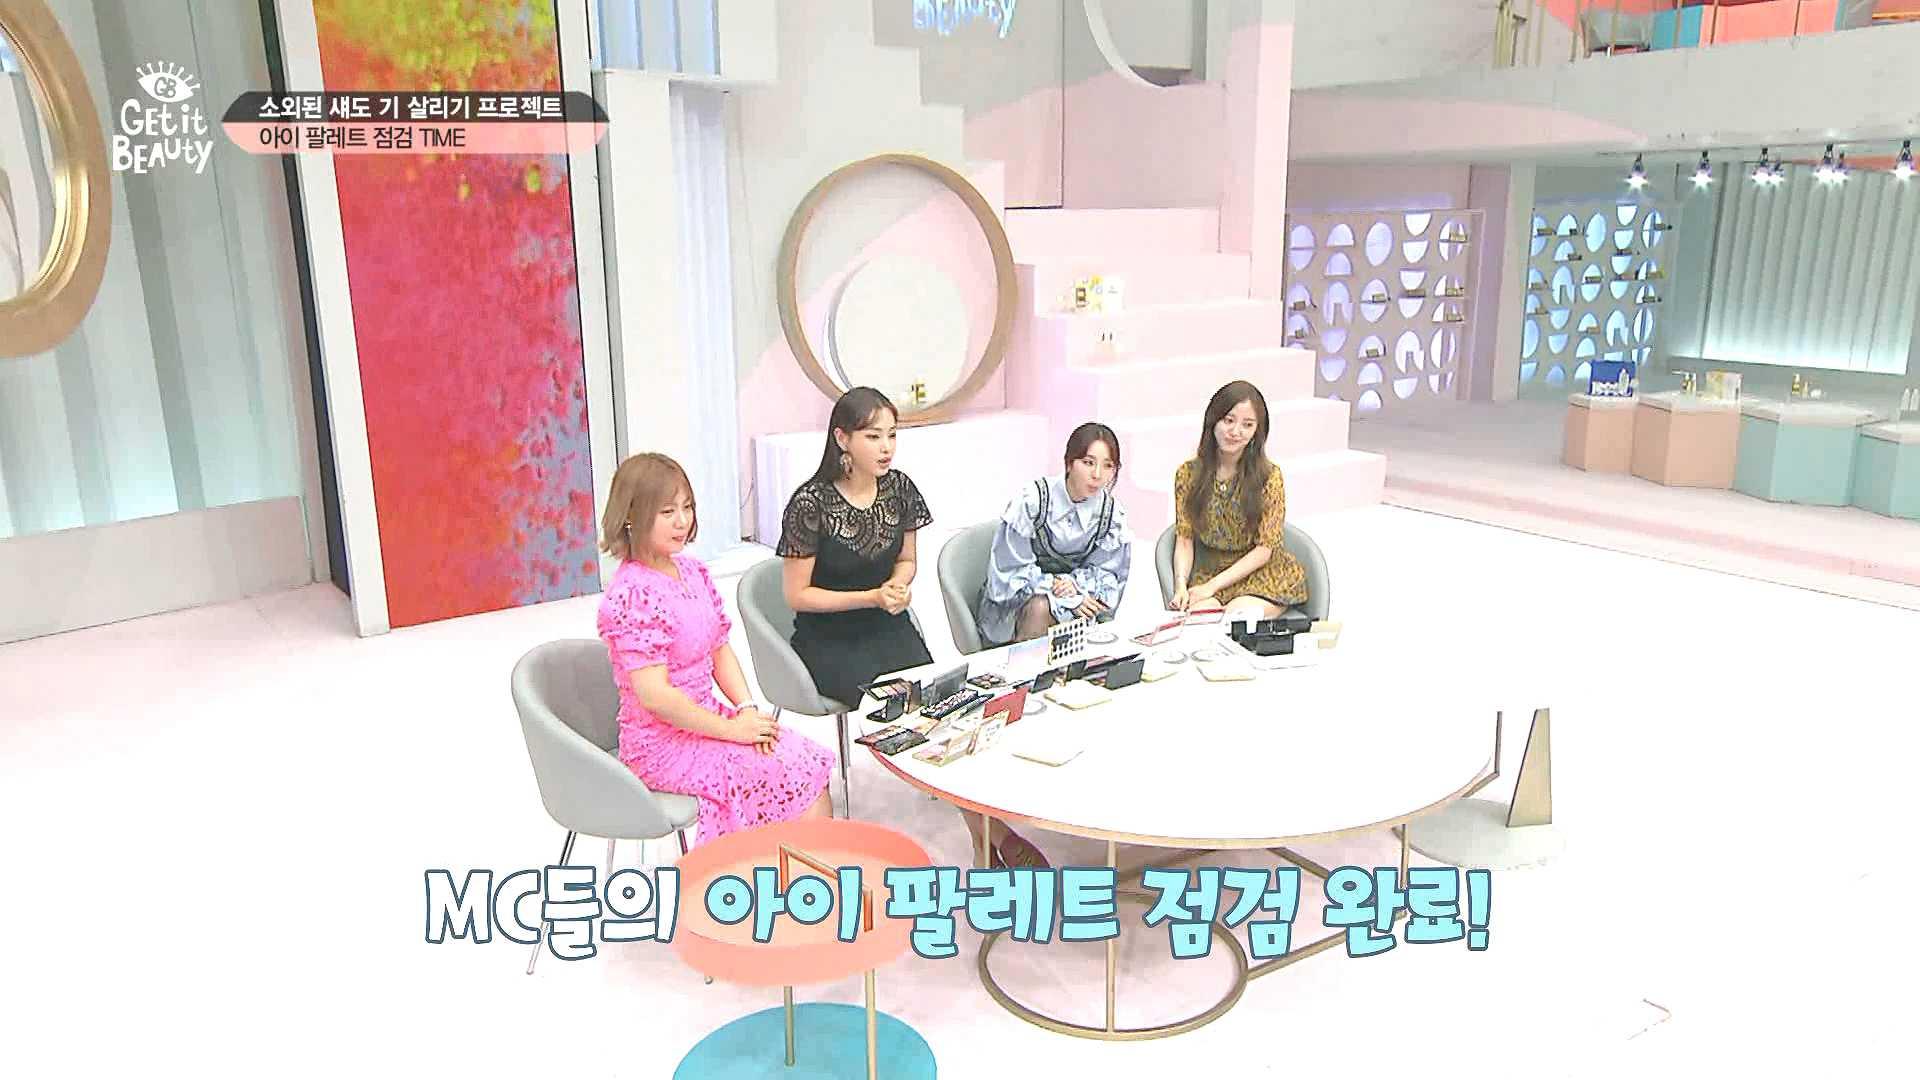 MC들의 아이 팔레트도 점검 완료 !